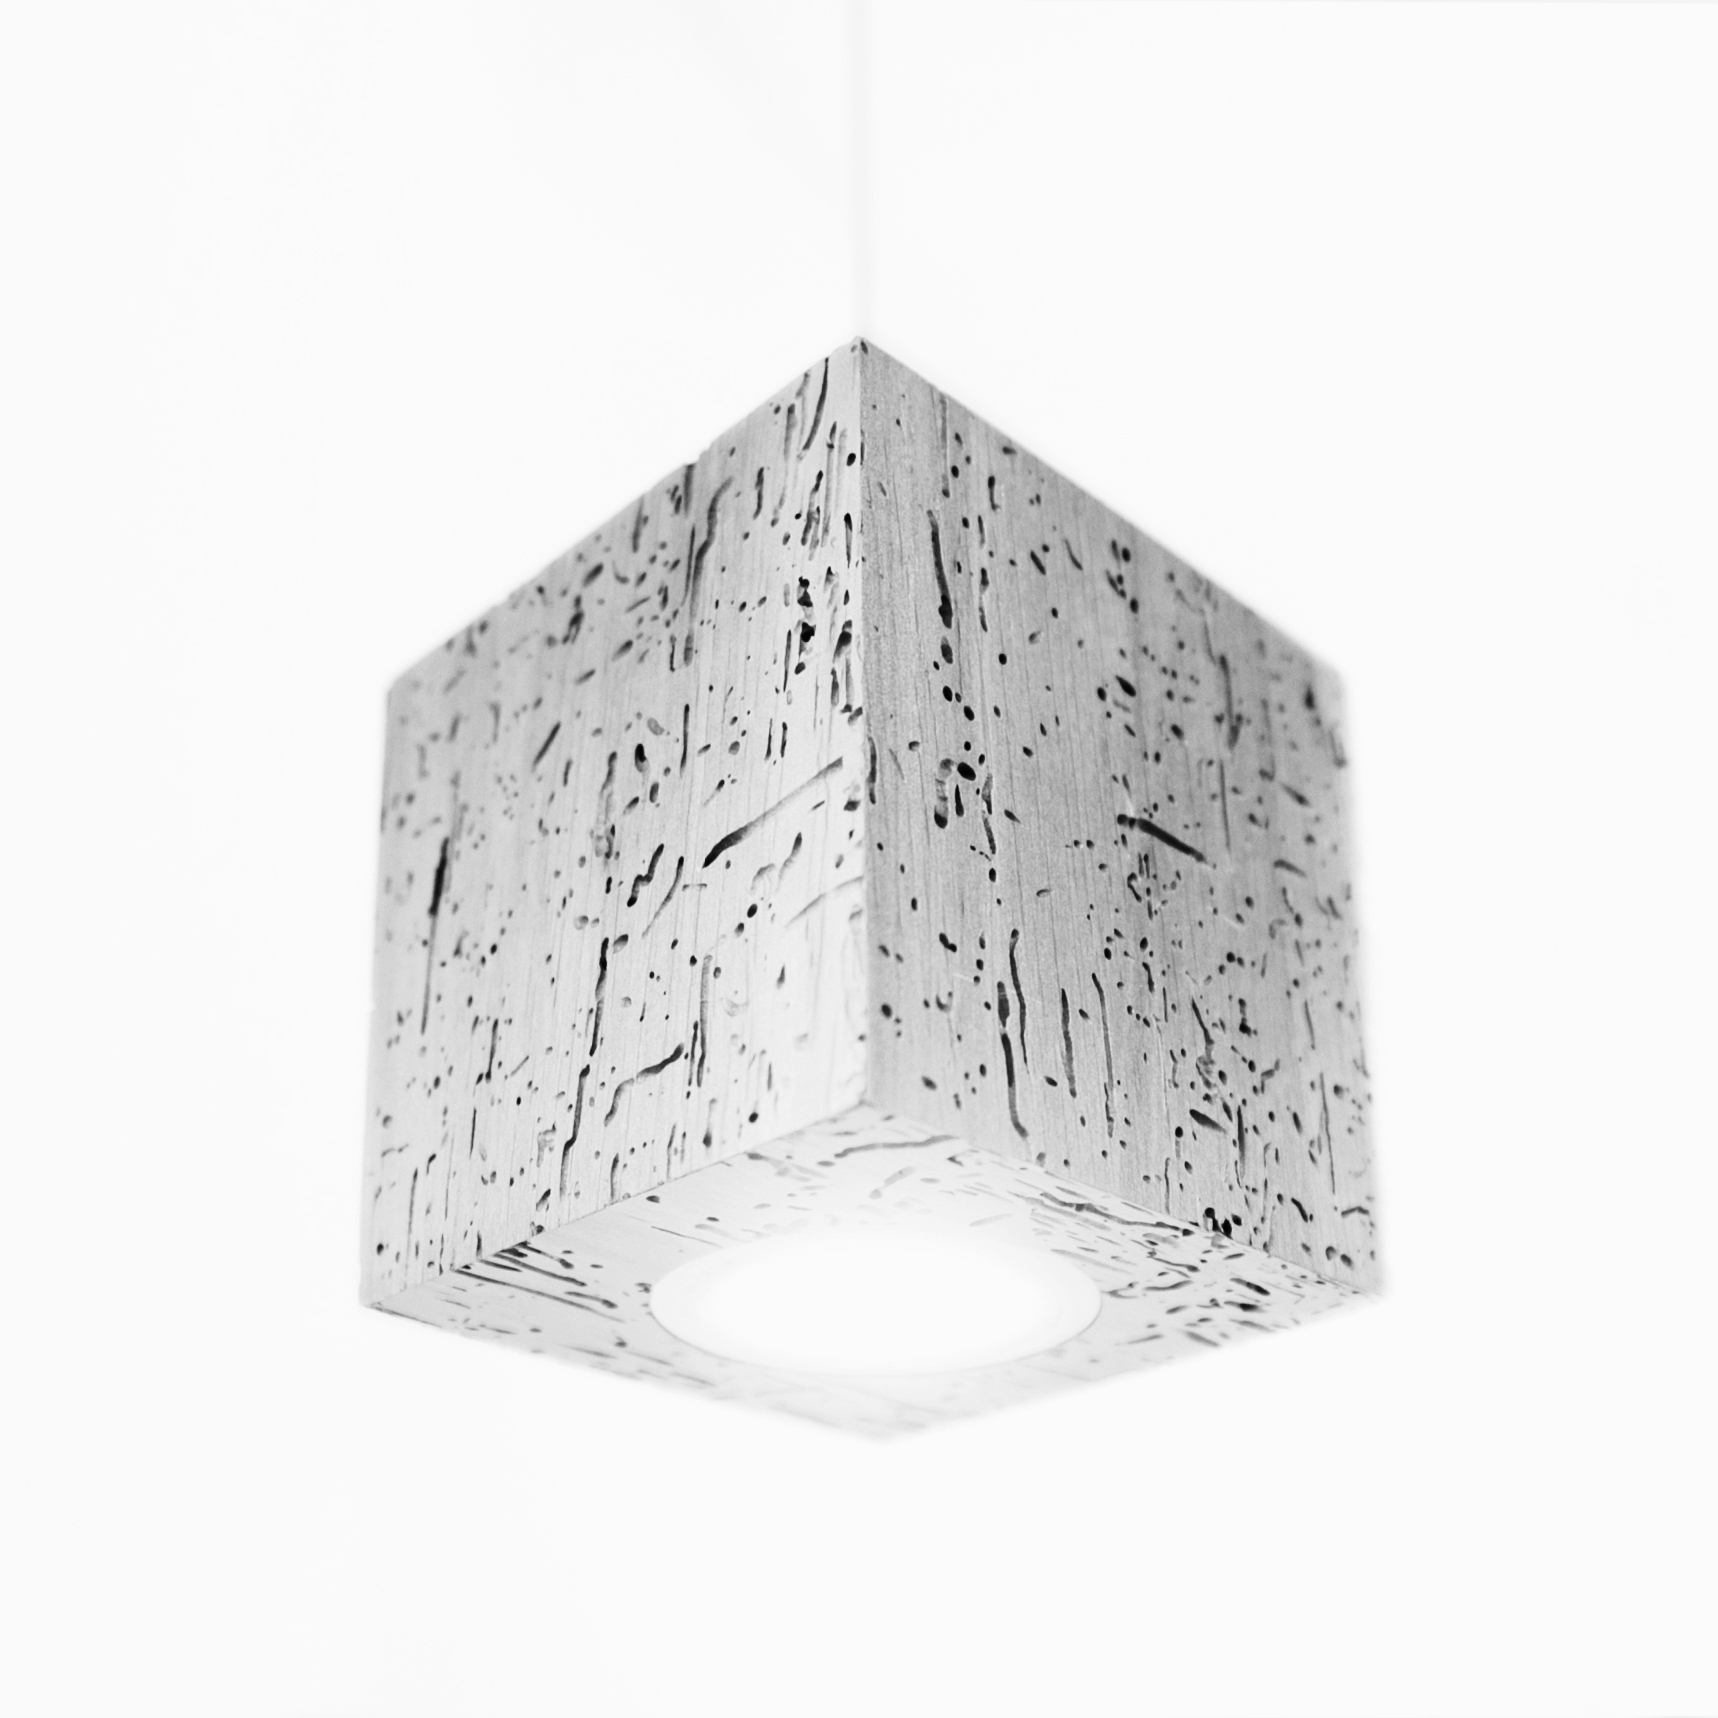 Rubicon_lamp_metra-studio_cover